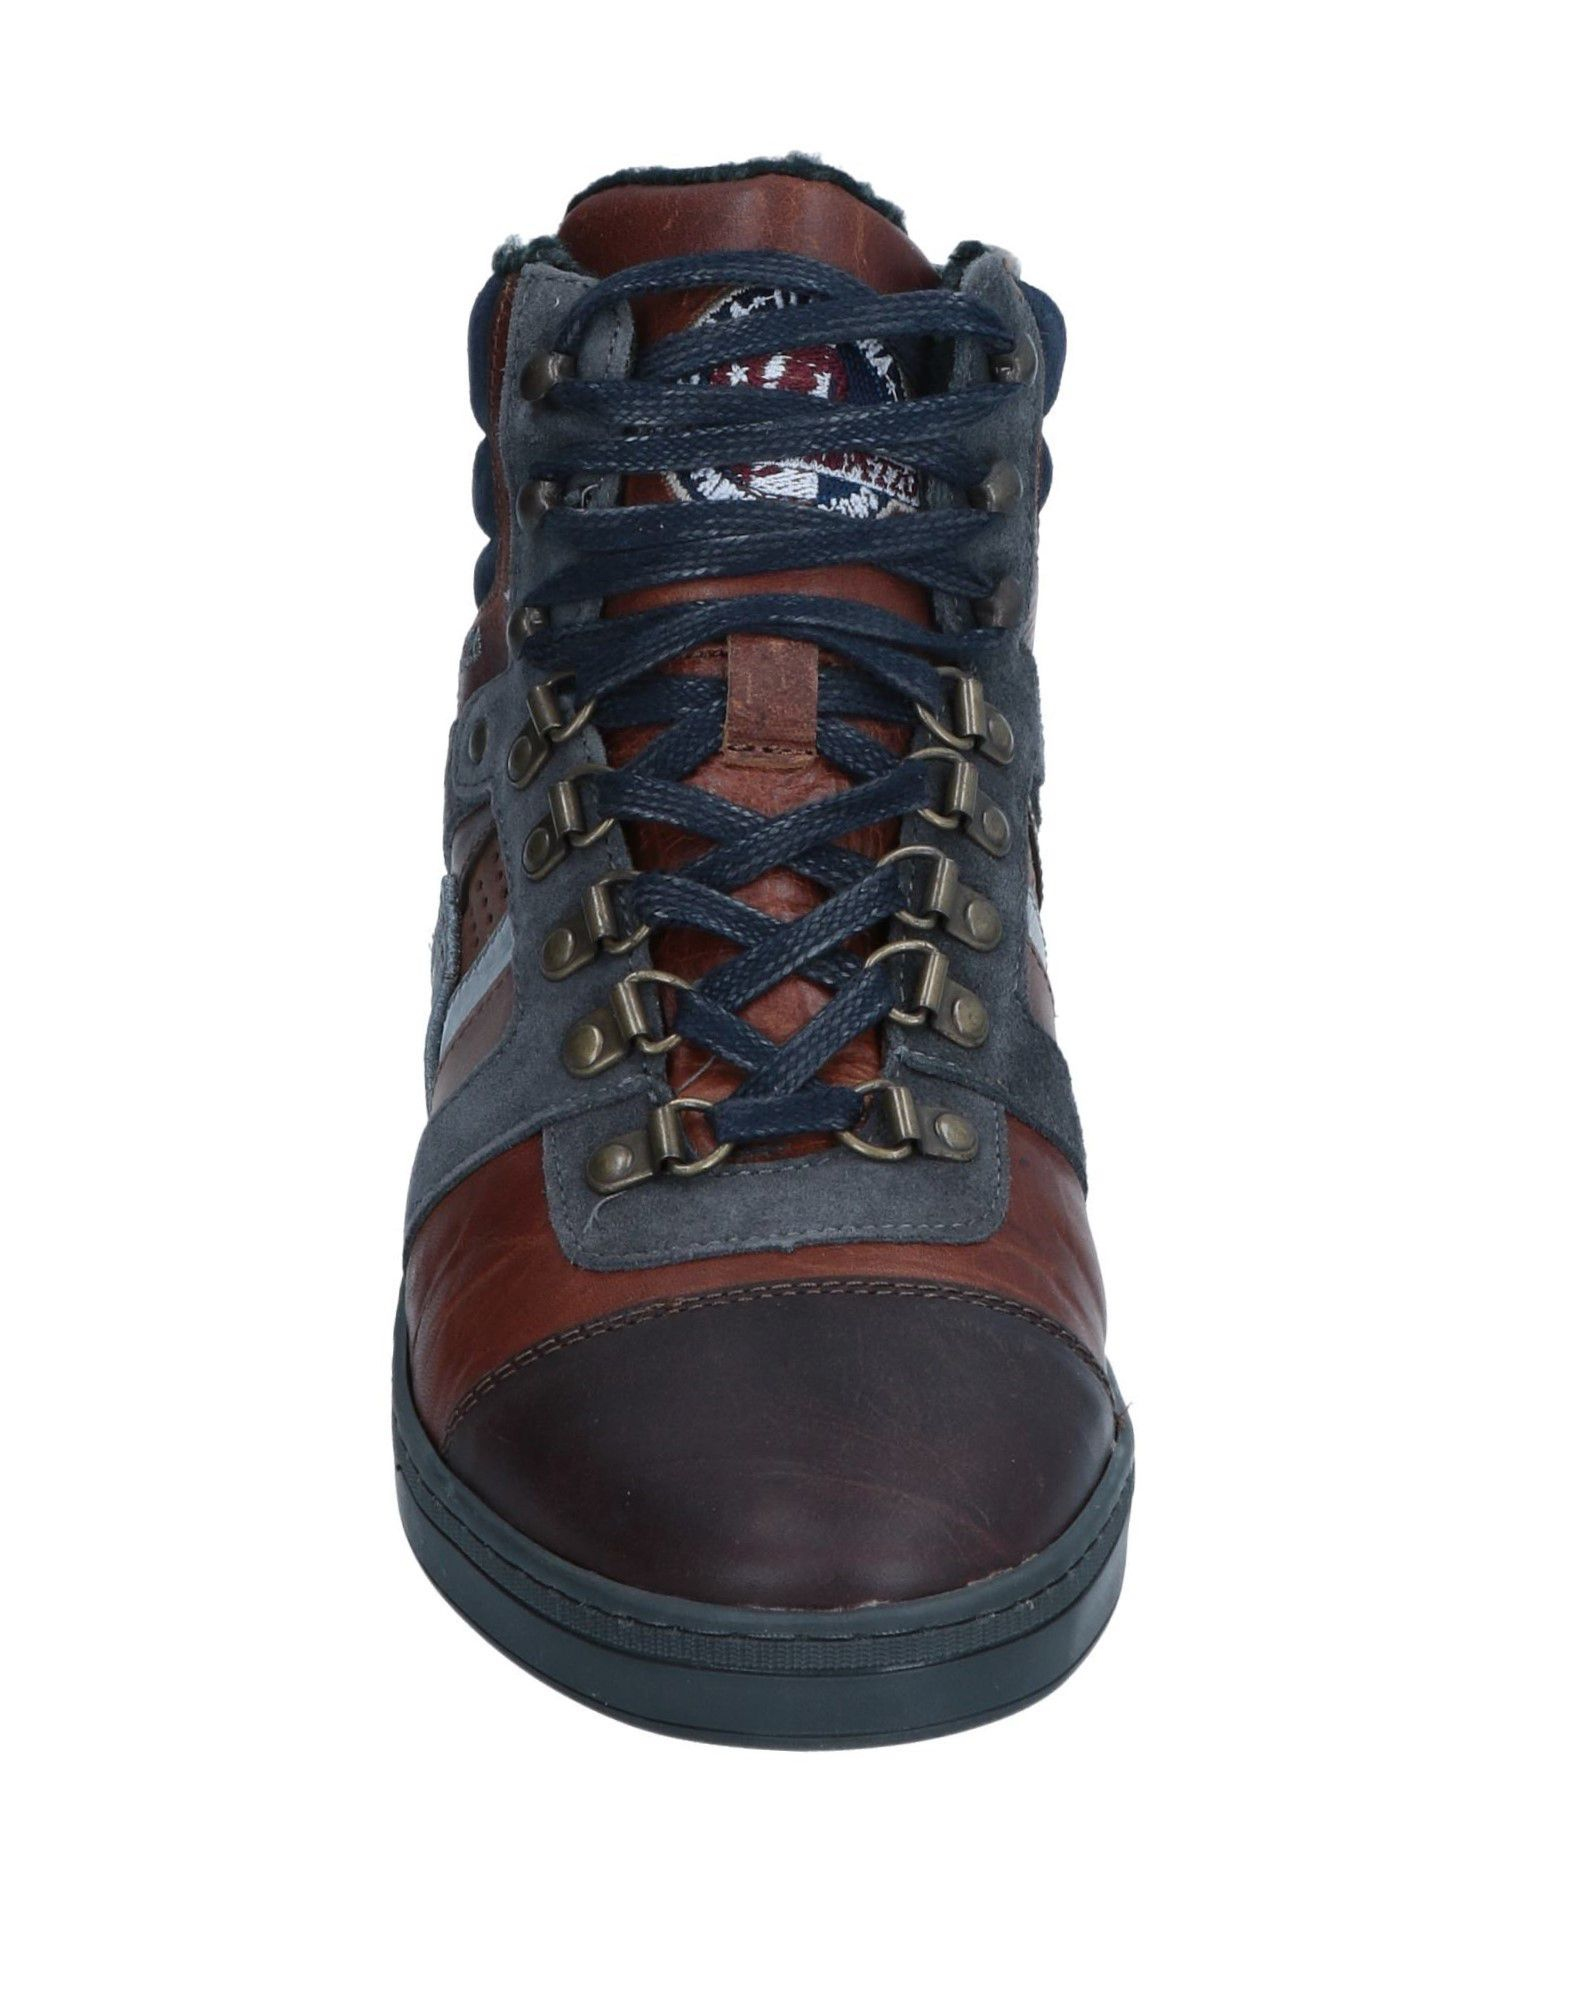 Rabatt Stiefelette echte Schuhe Pantofola D'oro Stiefelette Rabatt Herren  11545452TB fc0492